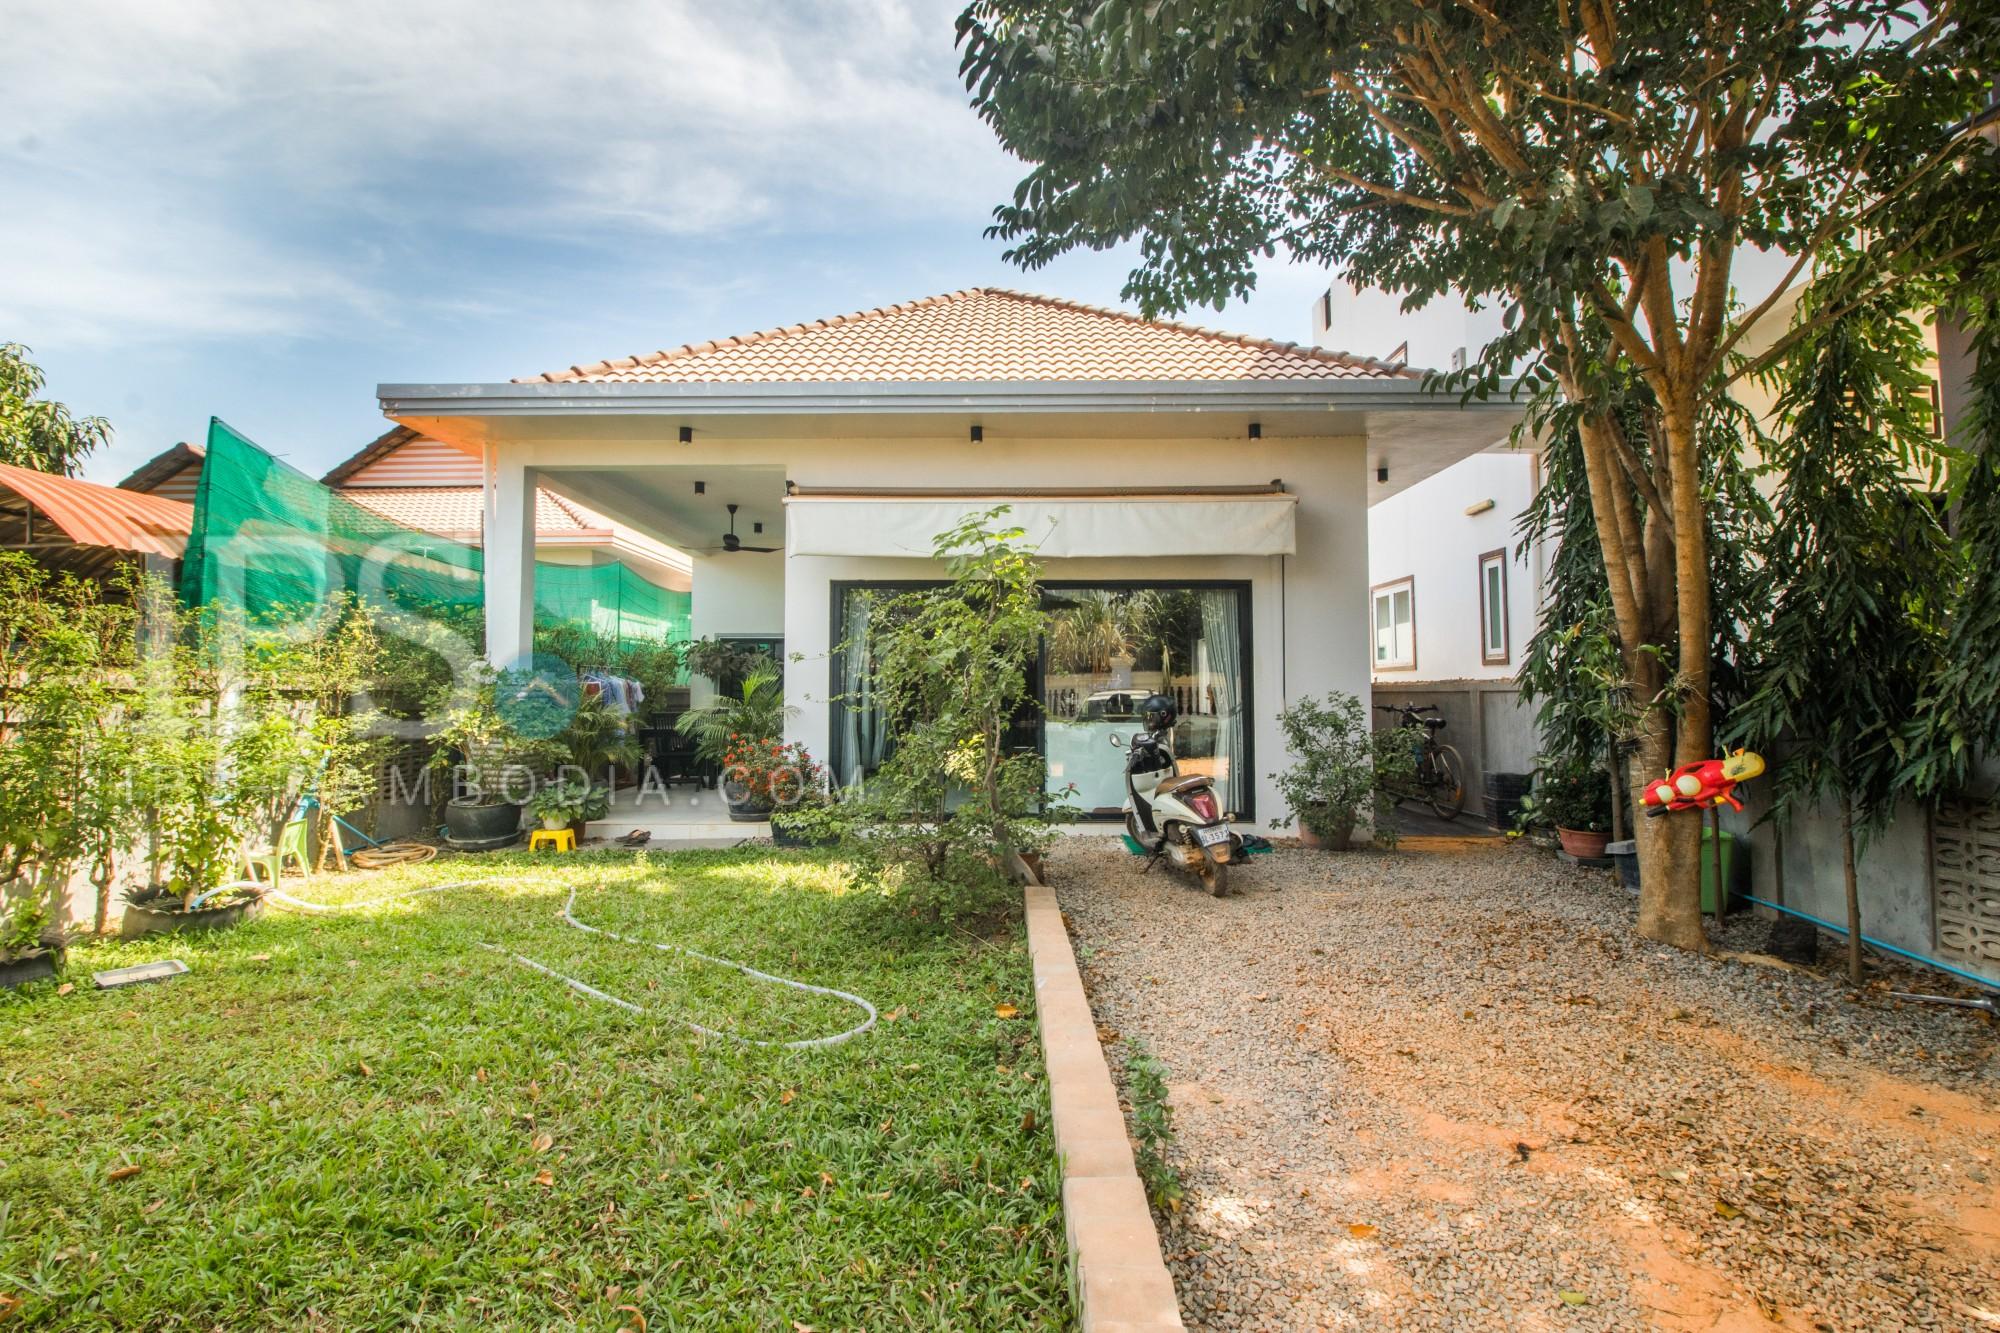 2 Bedroom western-style villa For Sale - Kor Kranh, Siem Reap